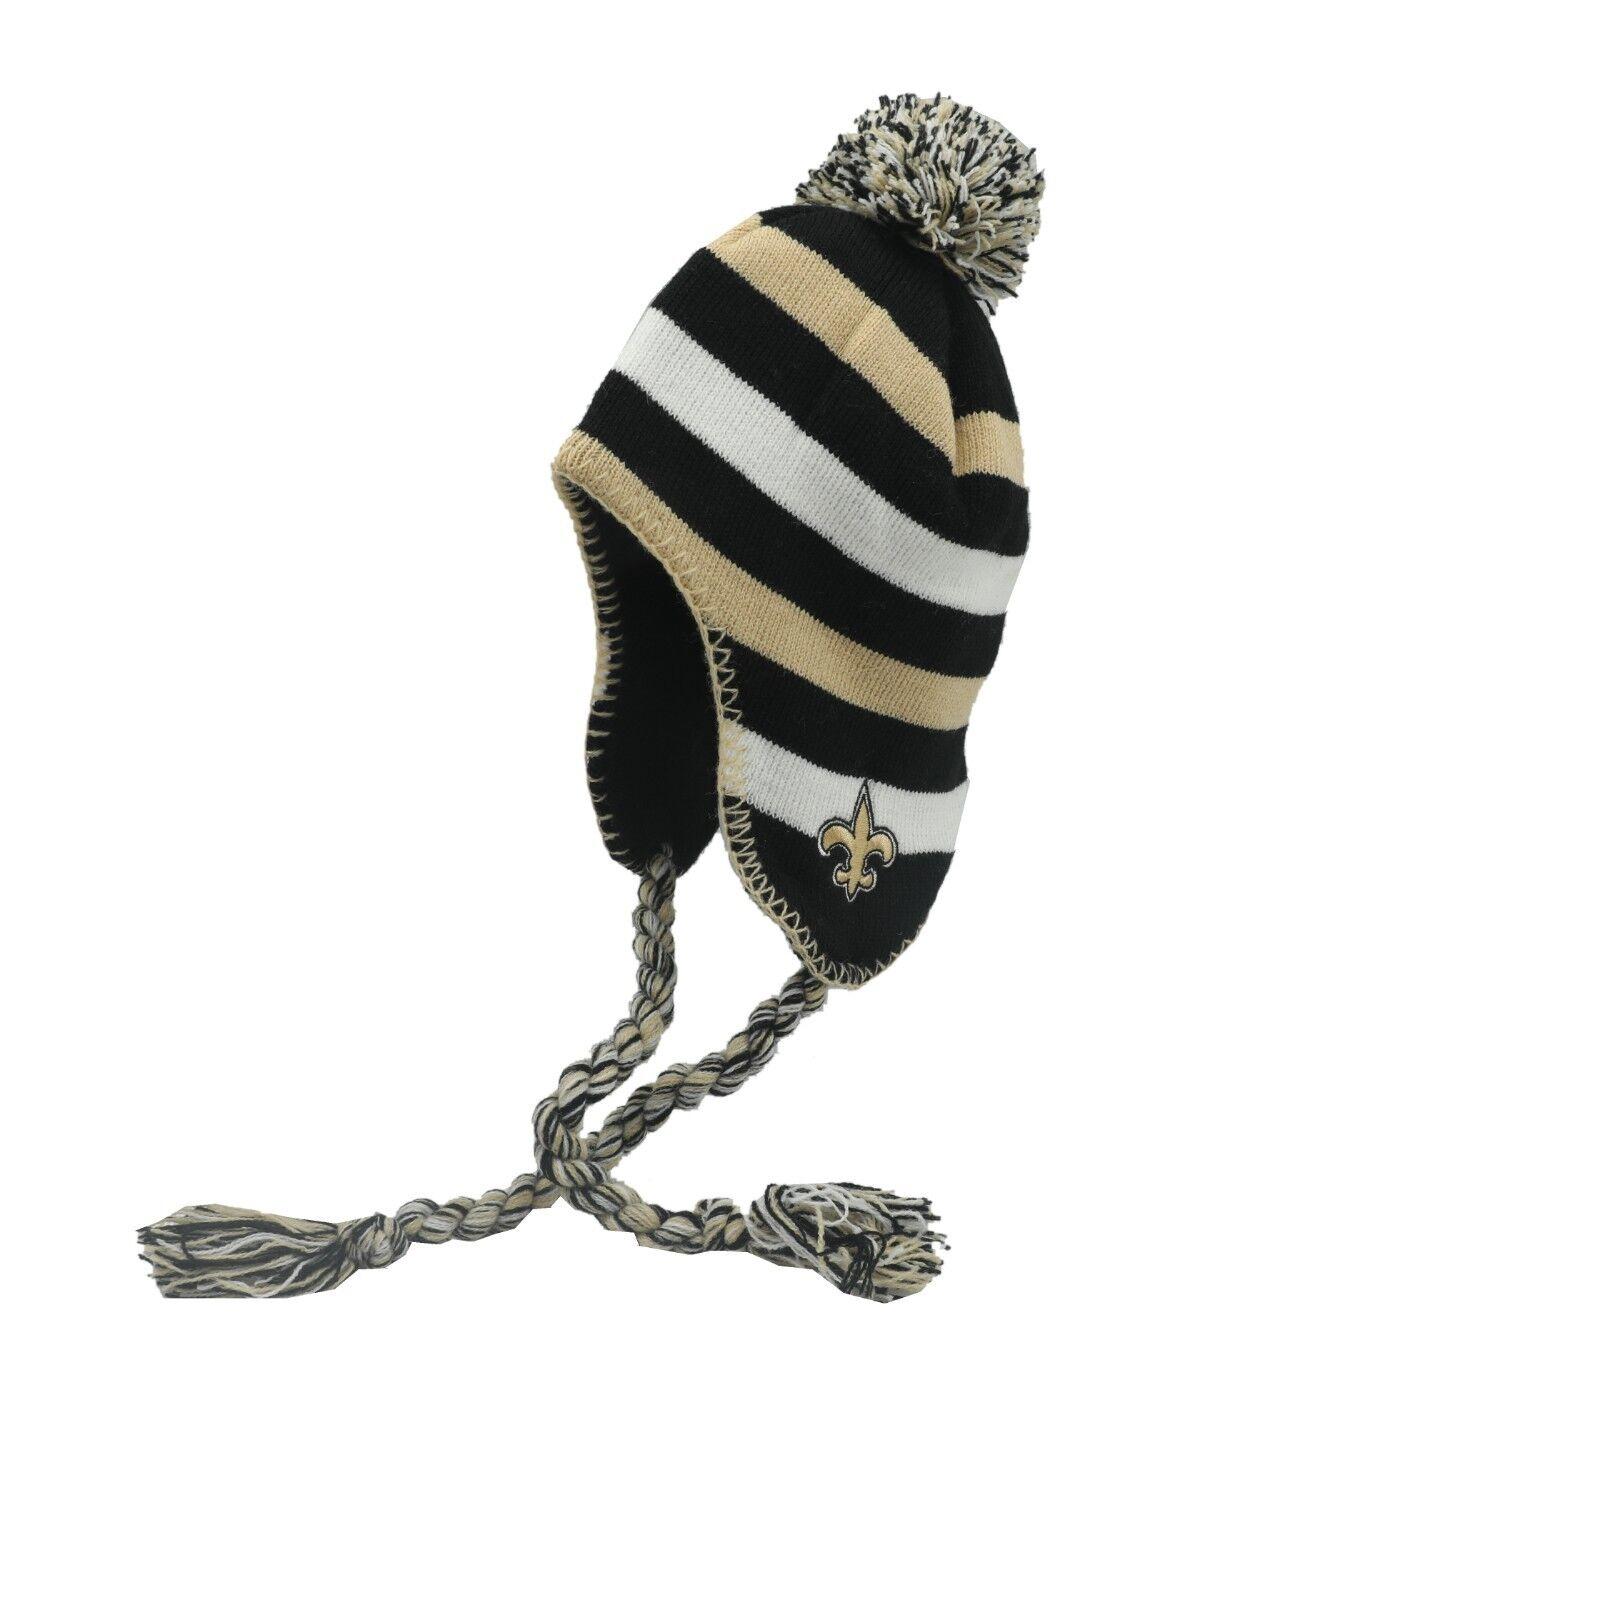 2-4T) OSFM Pom Winter Hat